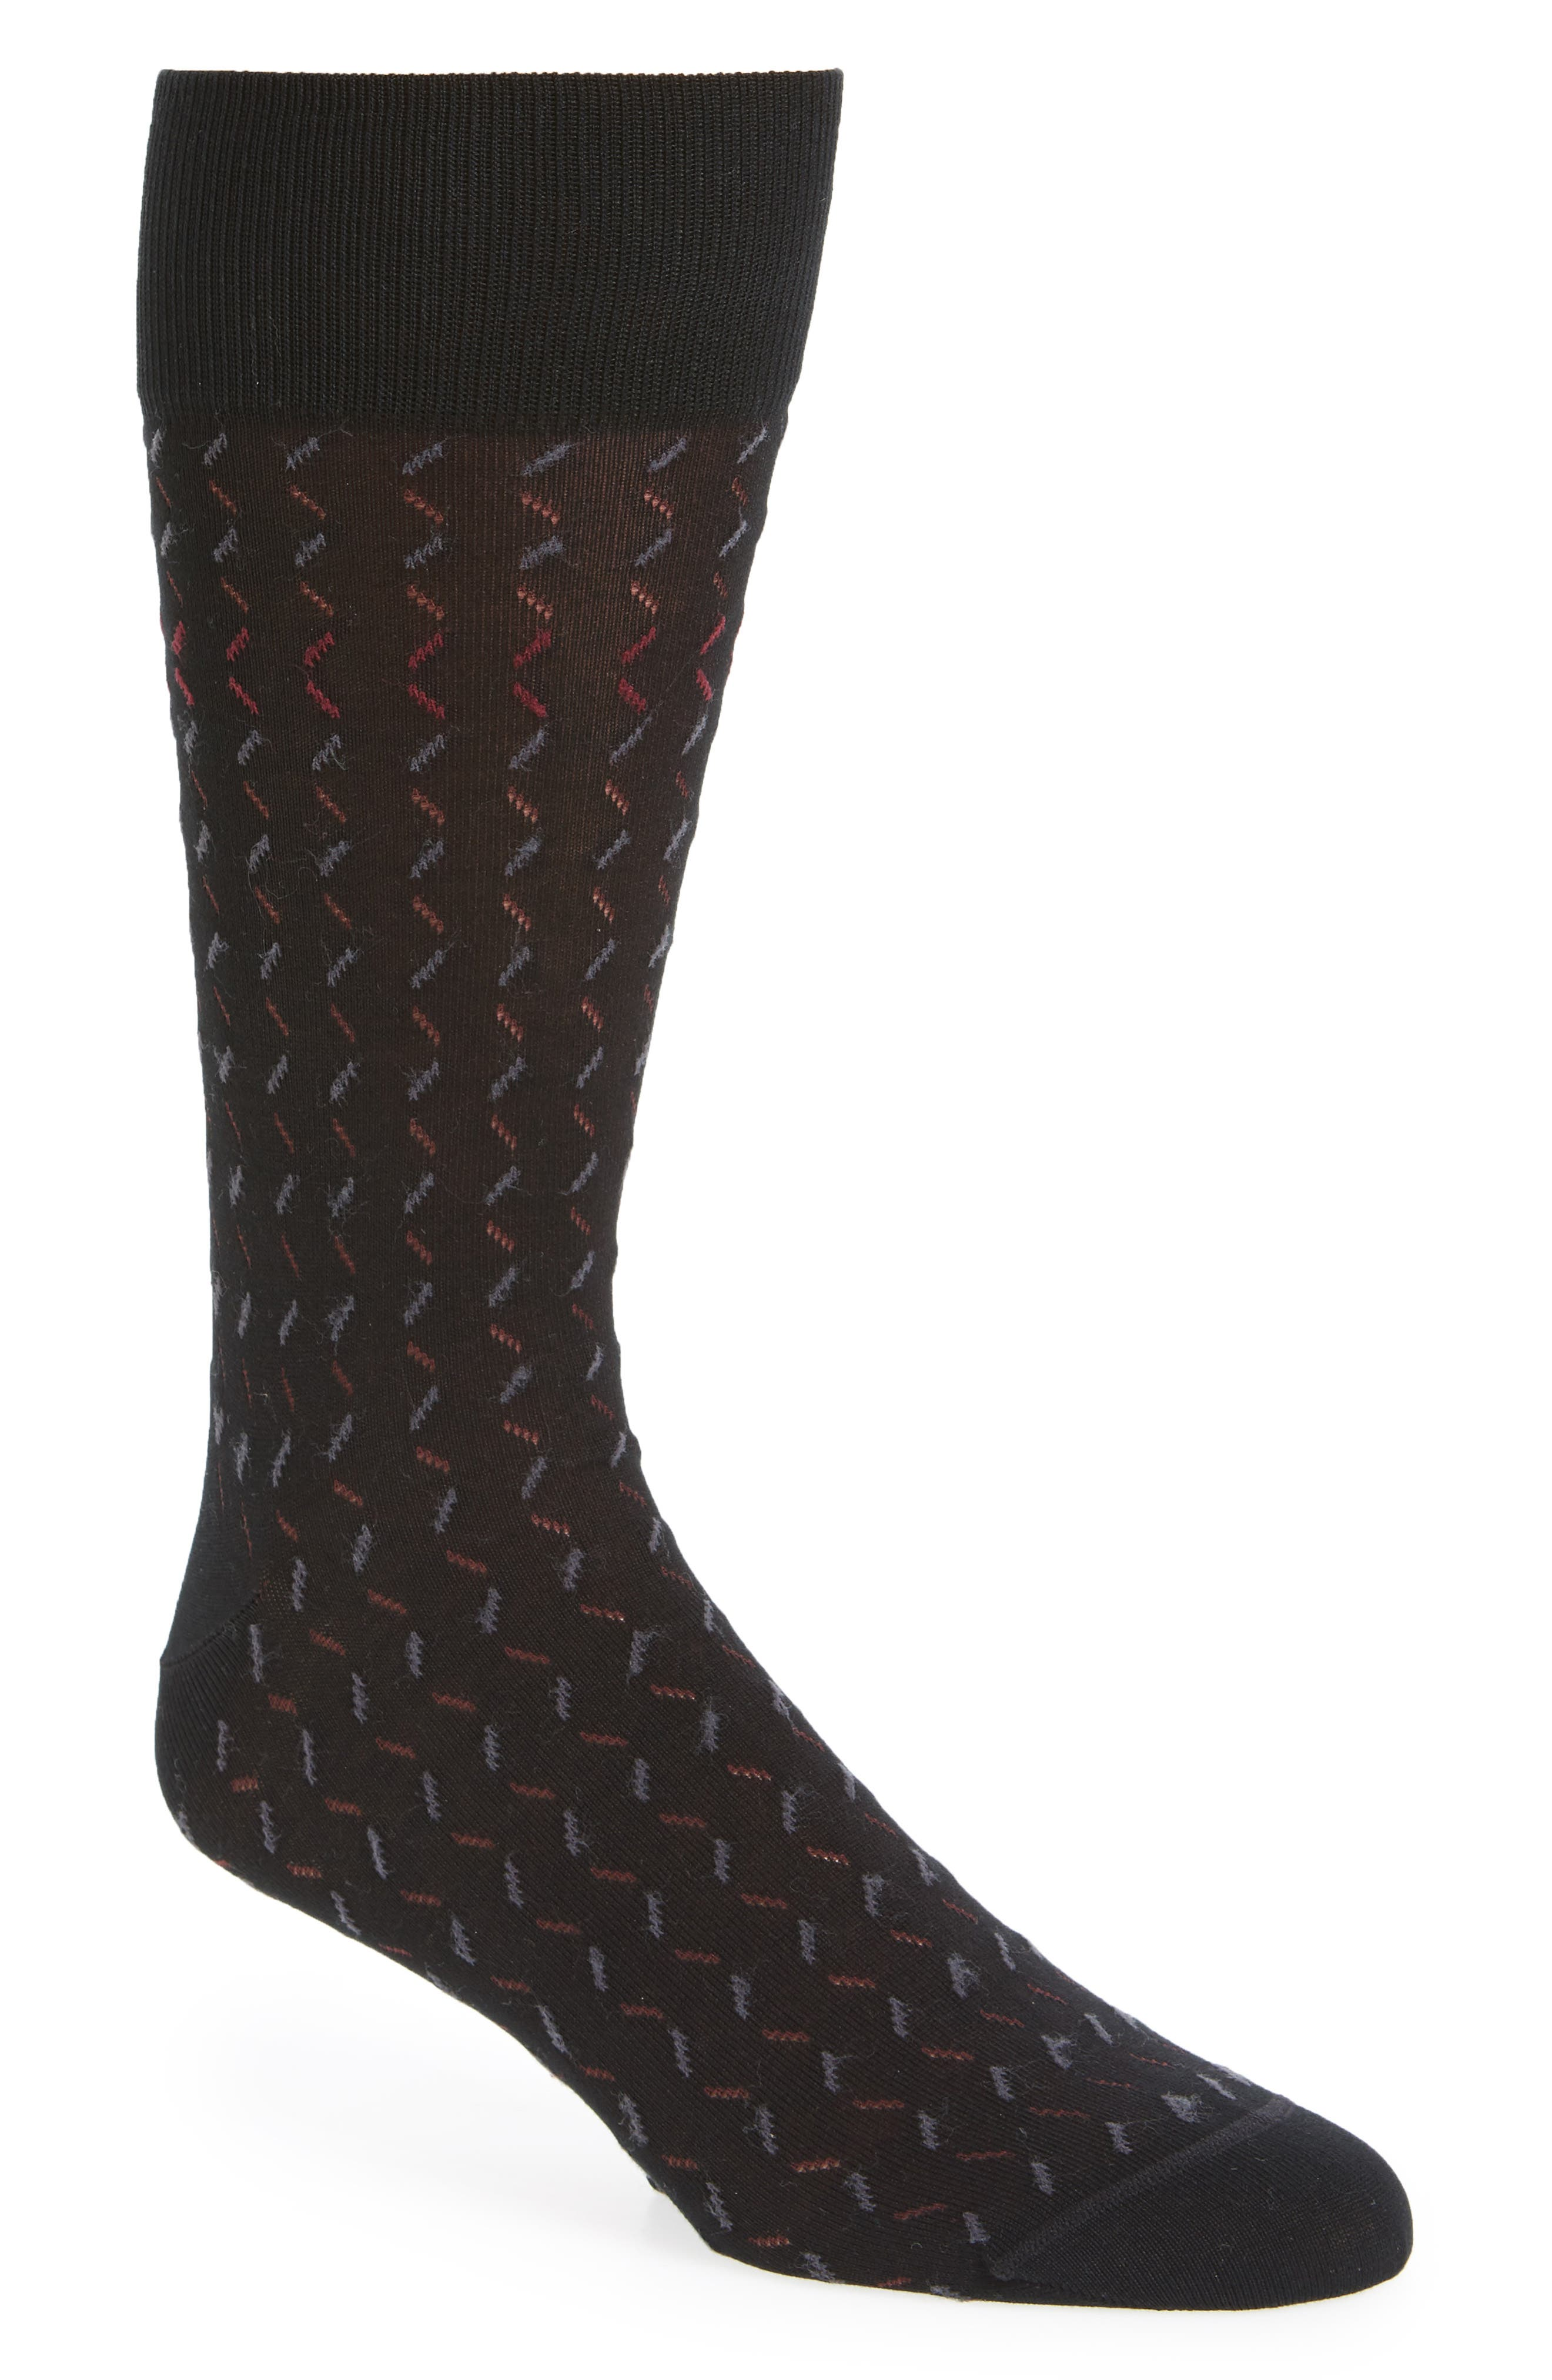 Dash Socks,                         Main,                         color, Black/ Burgundy